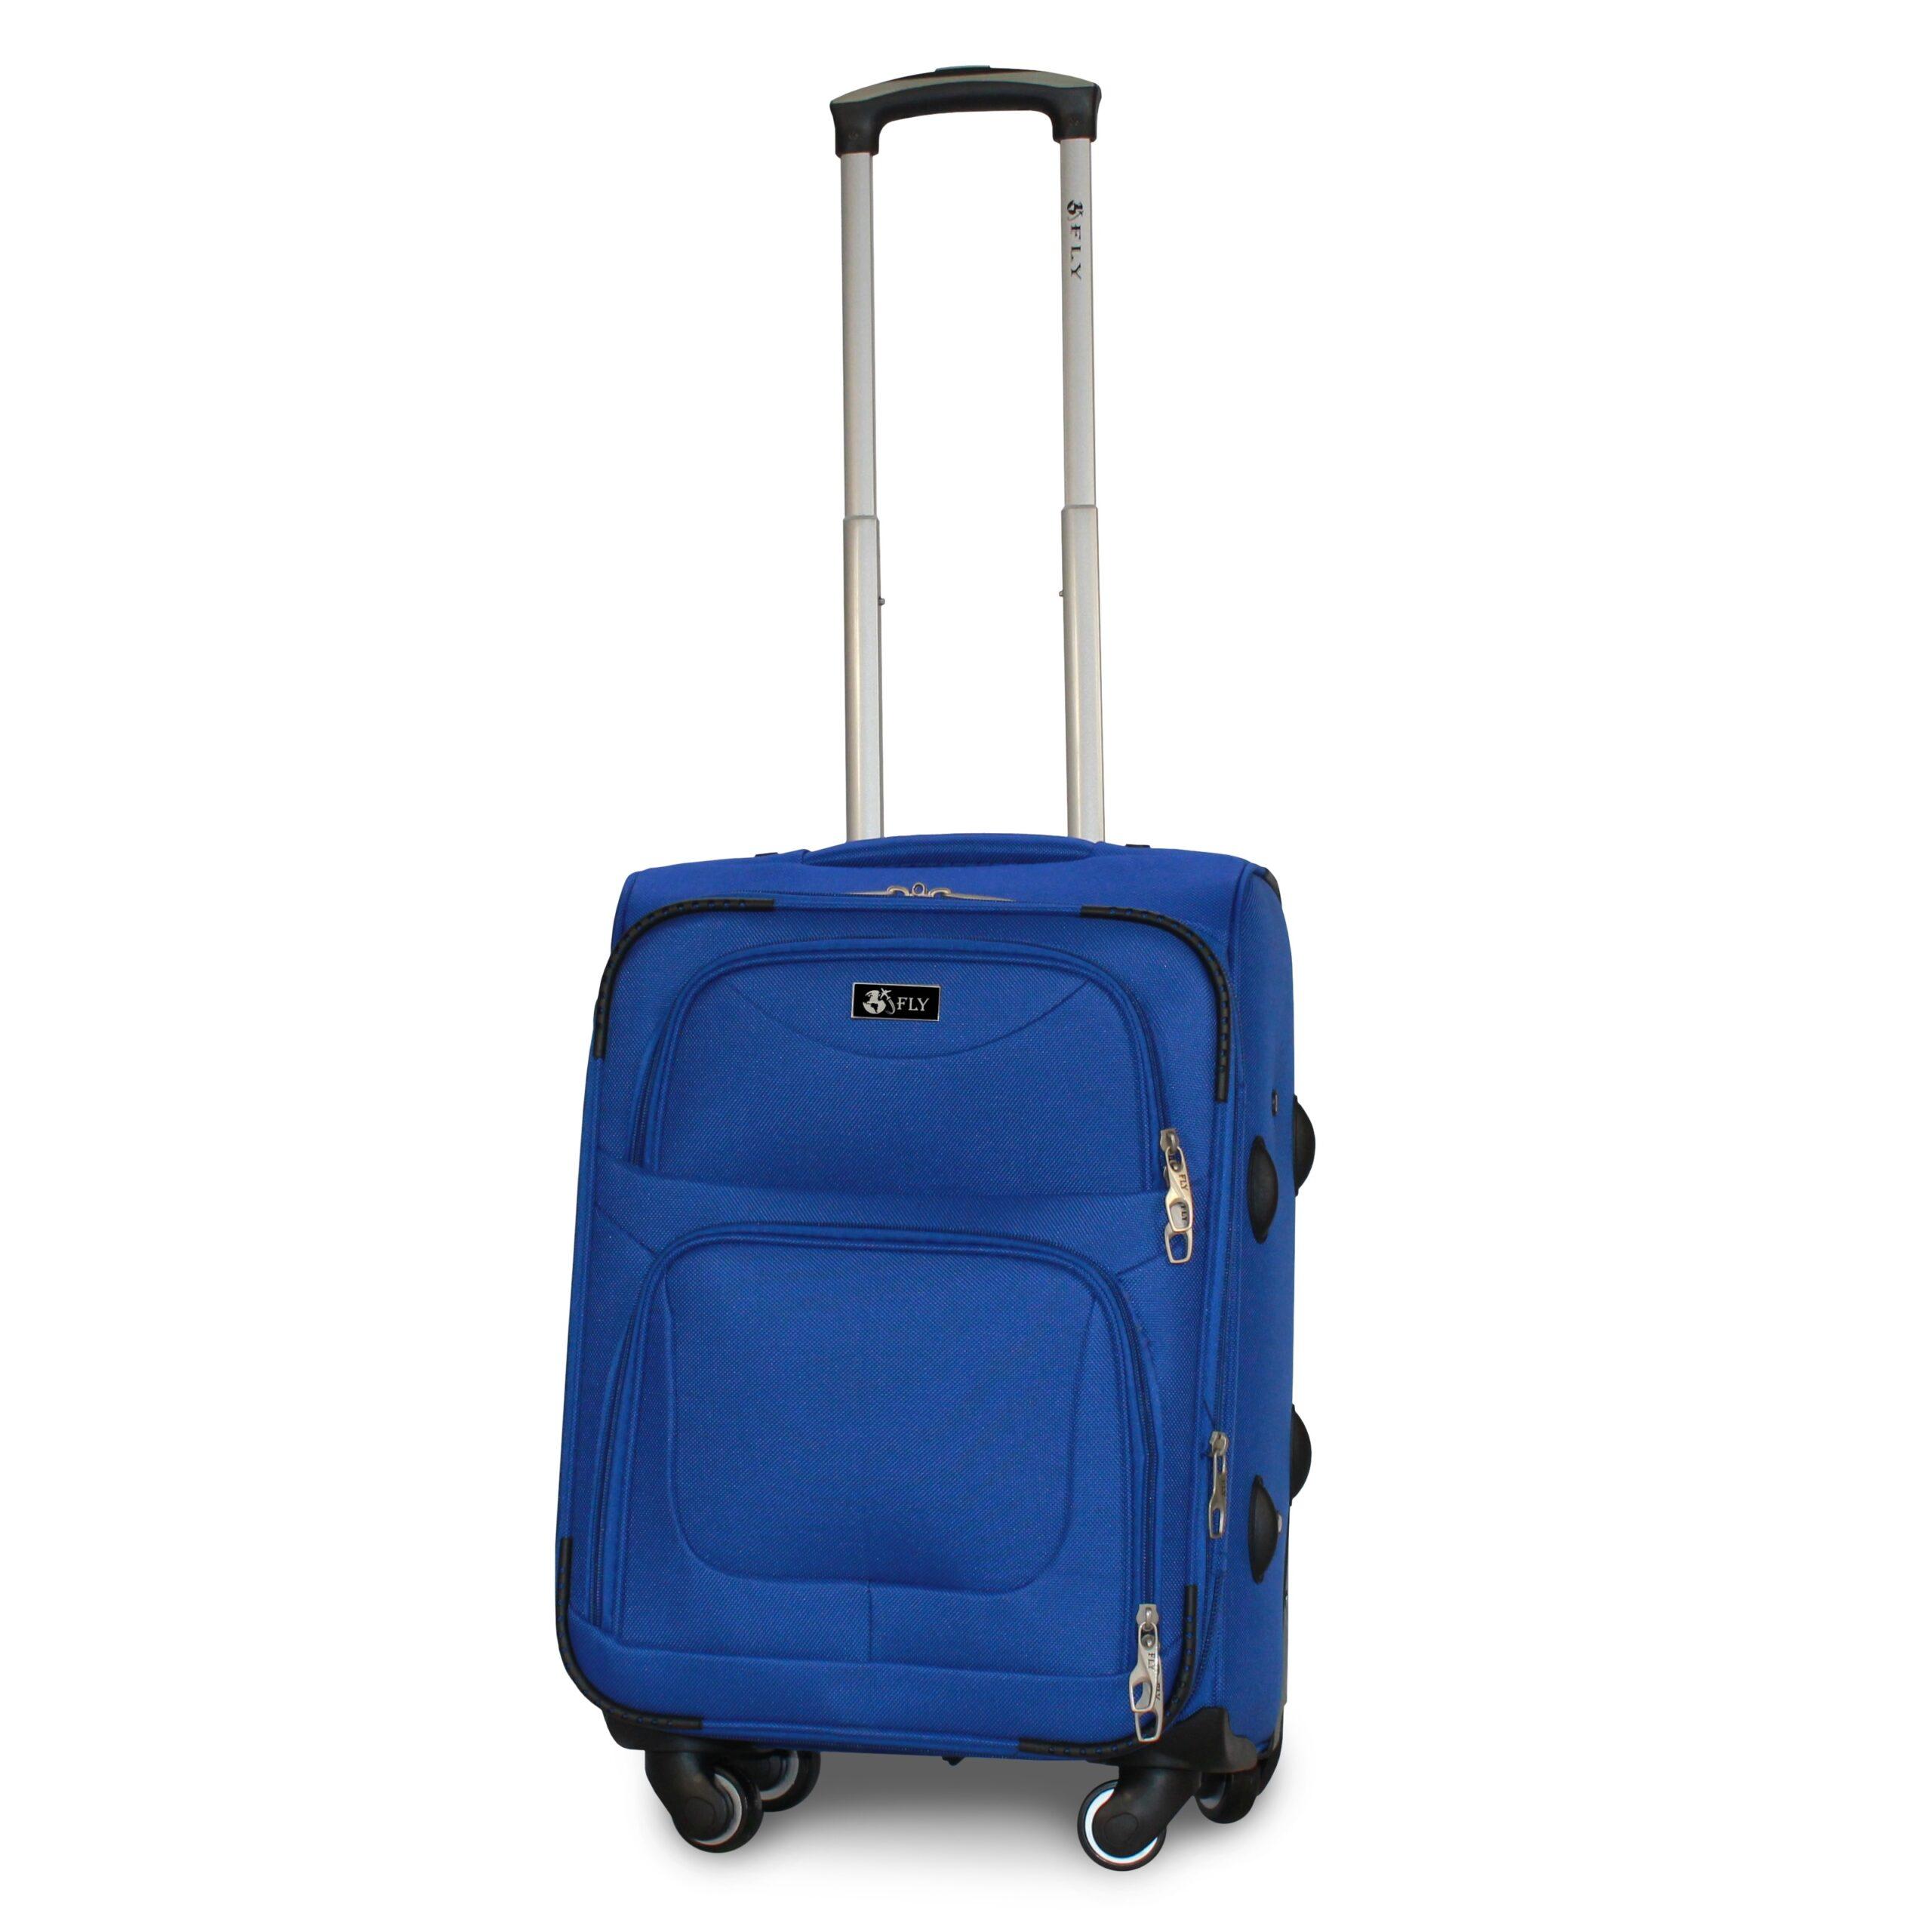 Маленький чемодан (S) Fly 1220-4k | тканевый